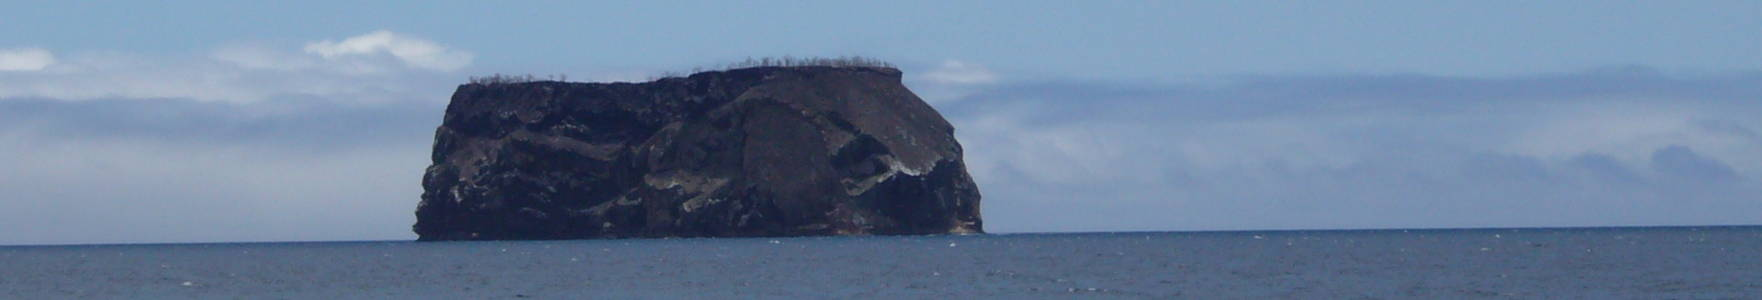 Islote en Galápagos.